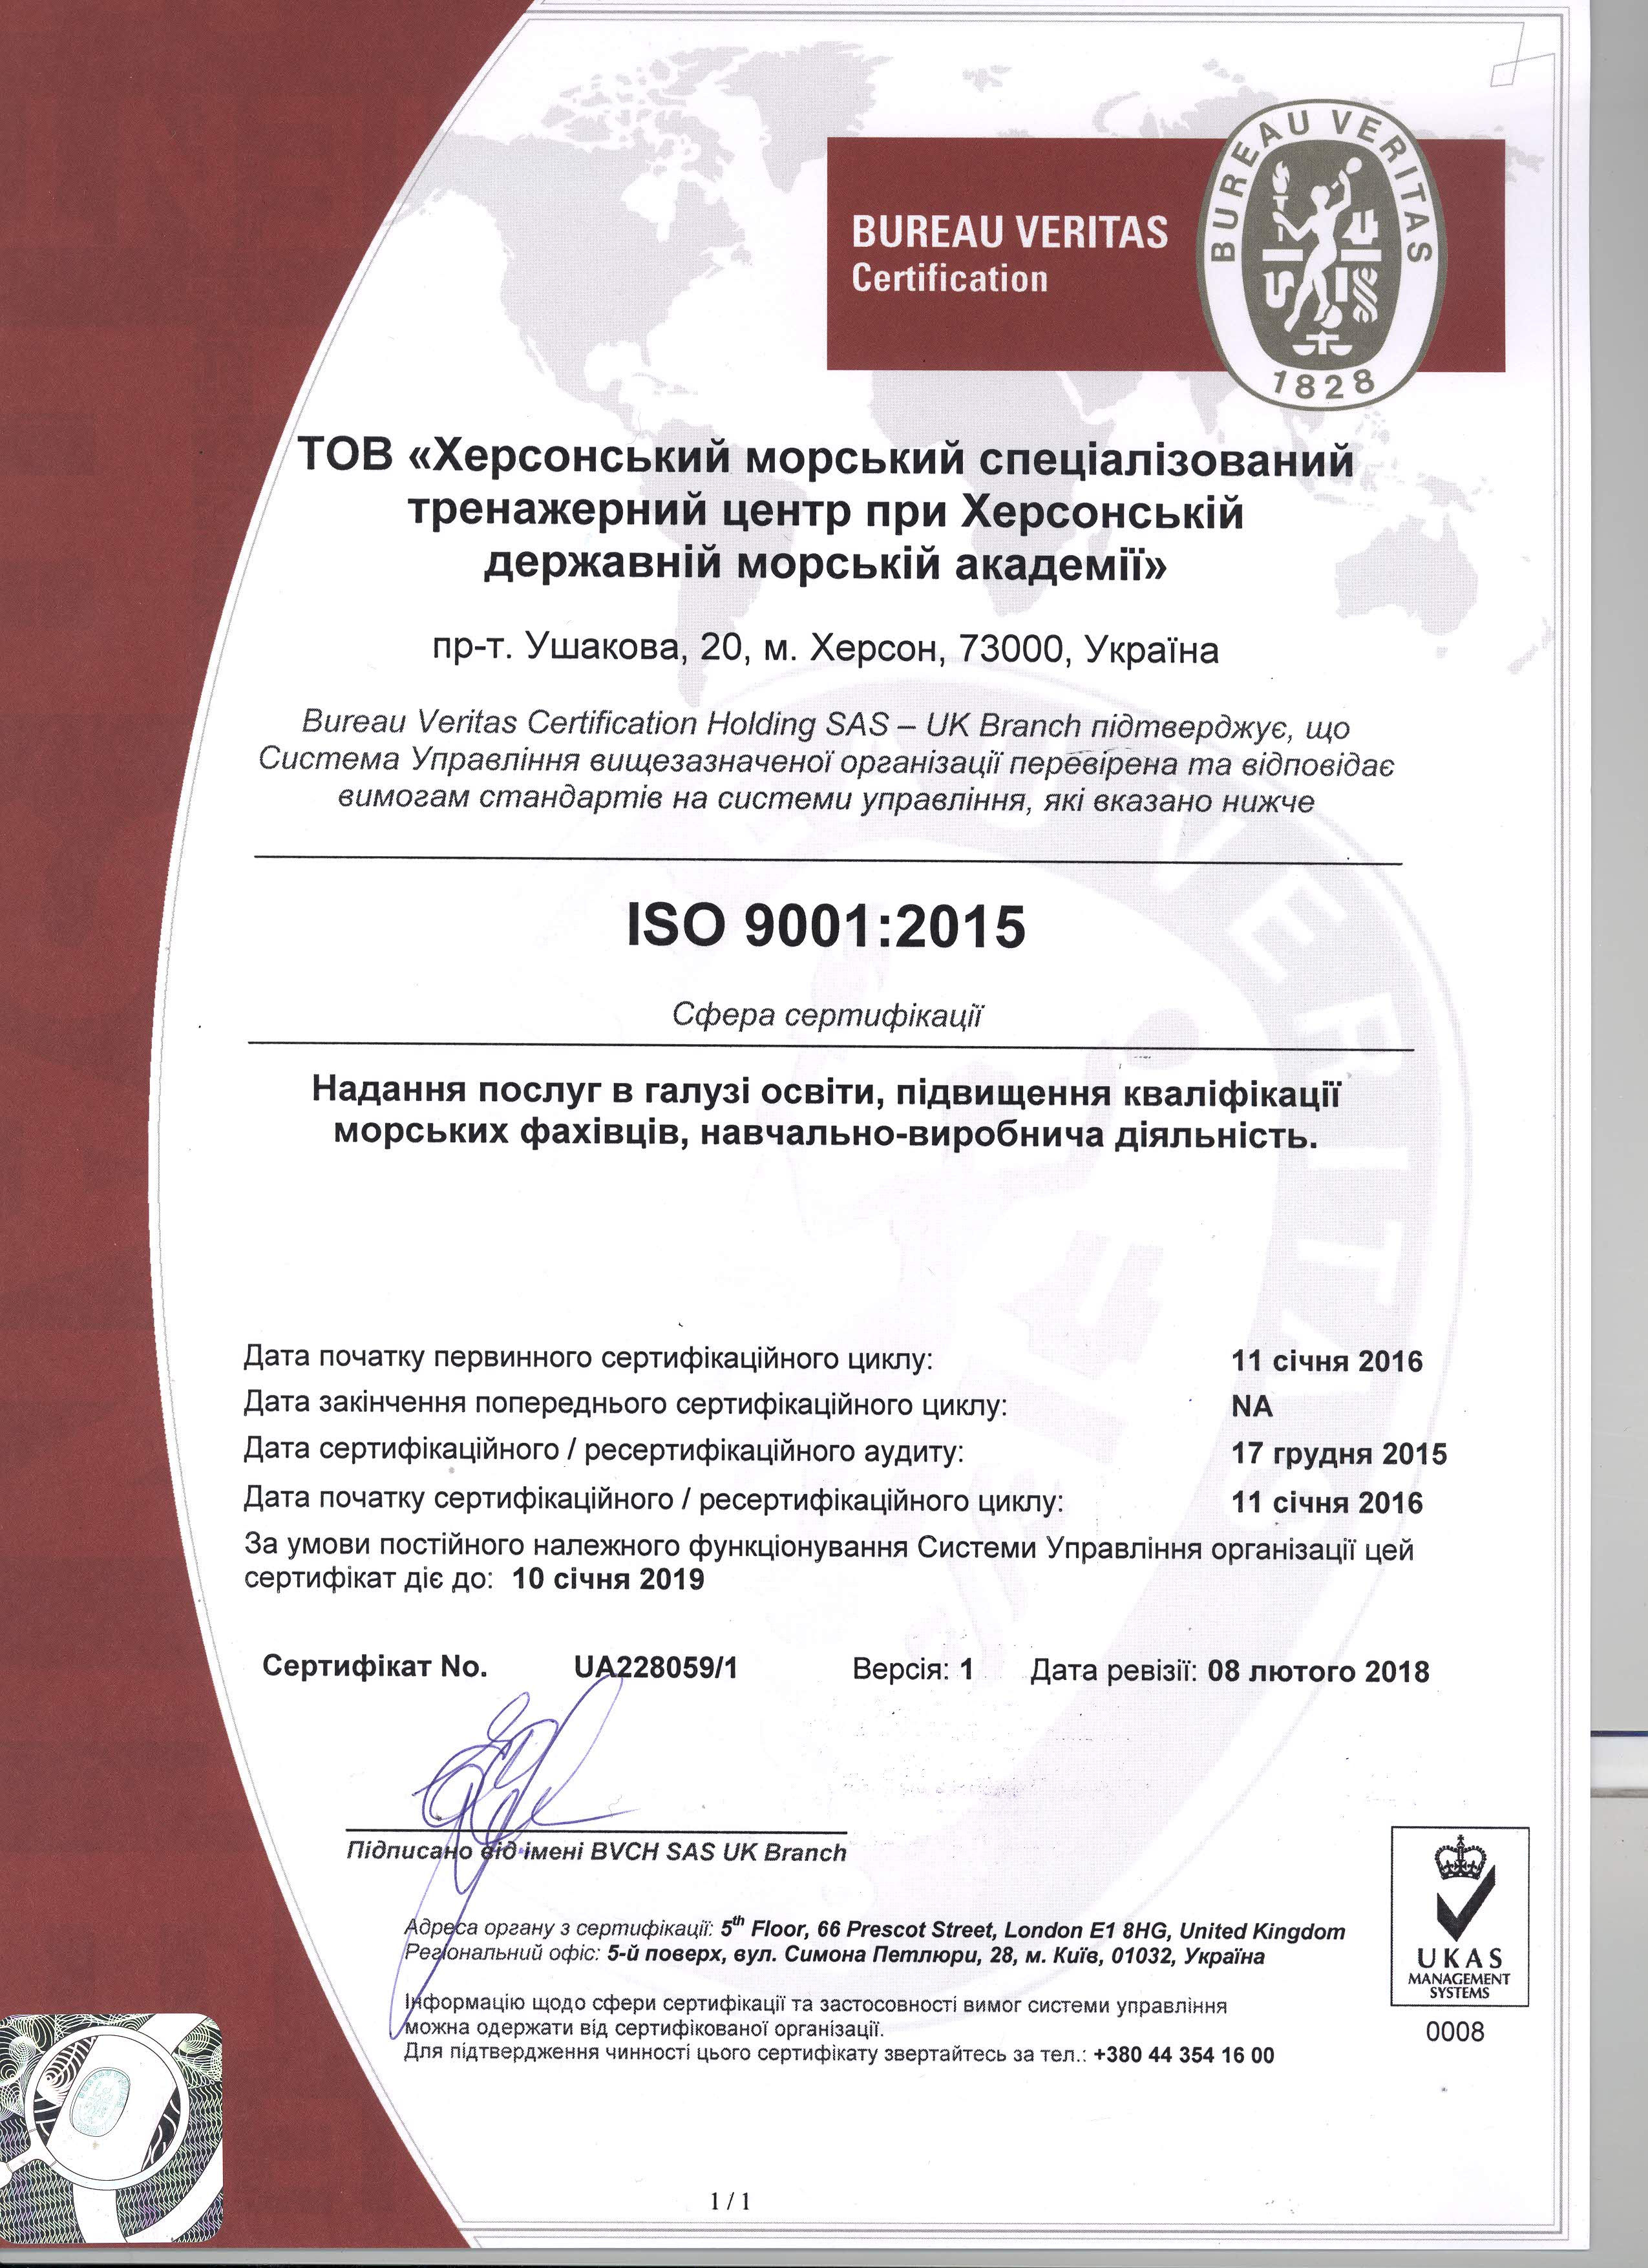 Bureau Veritas Certification Kherson Maritime Specialized